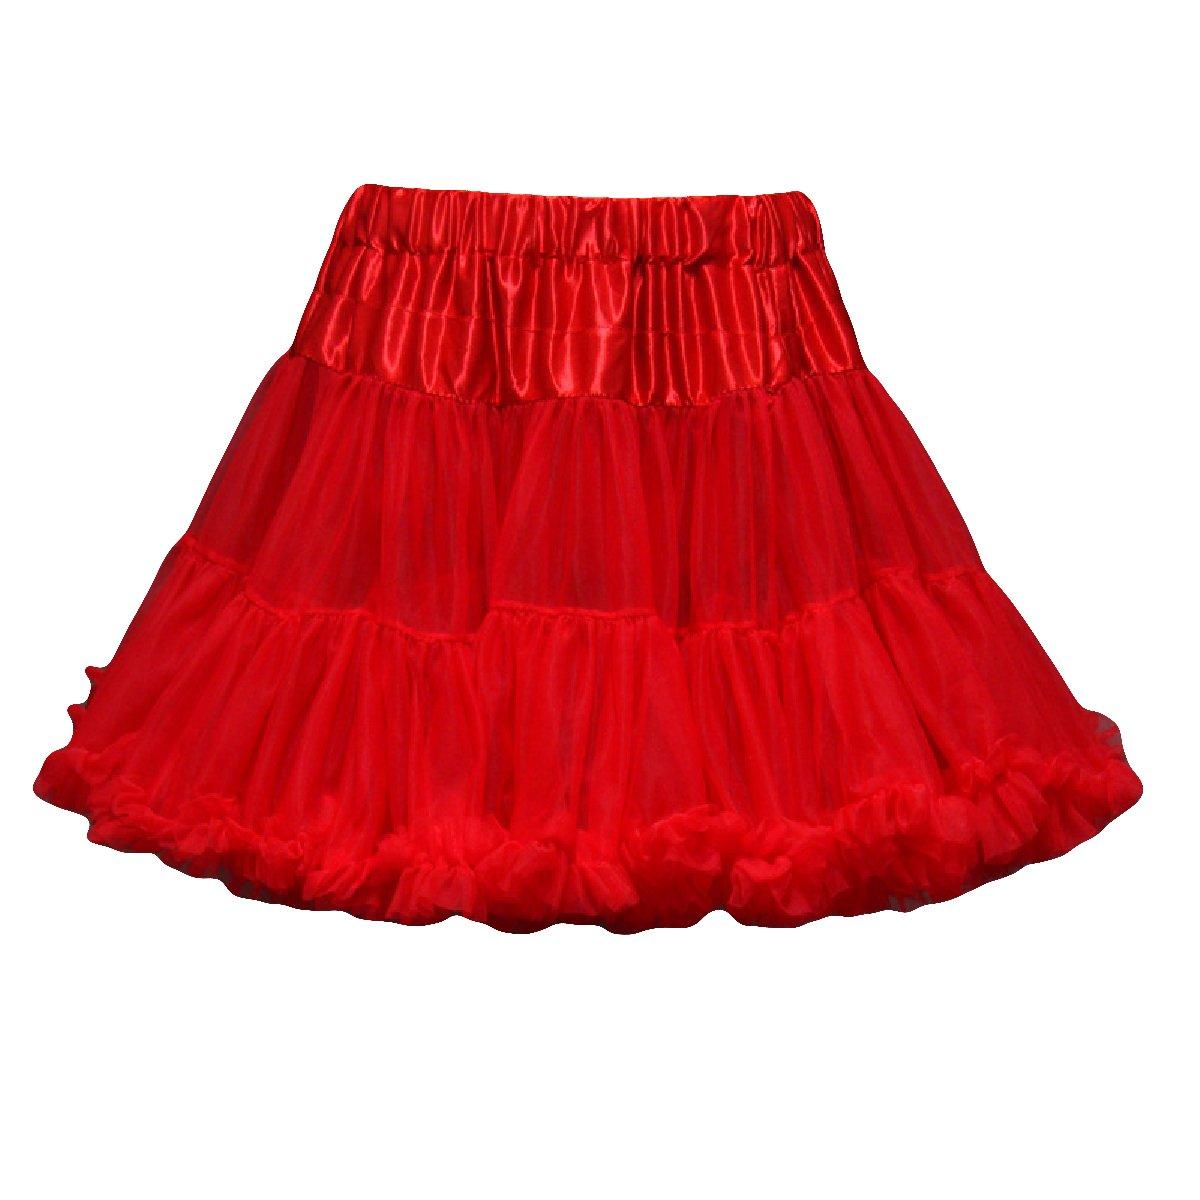 Monalia Kid's Tutu Skirt Half Slip Flower Girl Underskirt Wedding Petticoat MPC5 MPC005BK